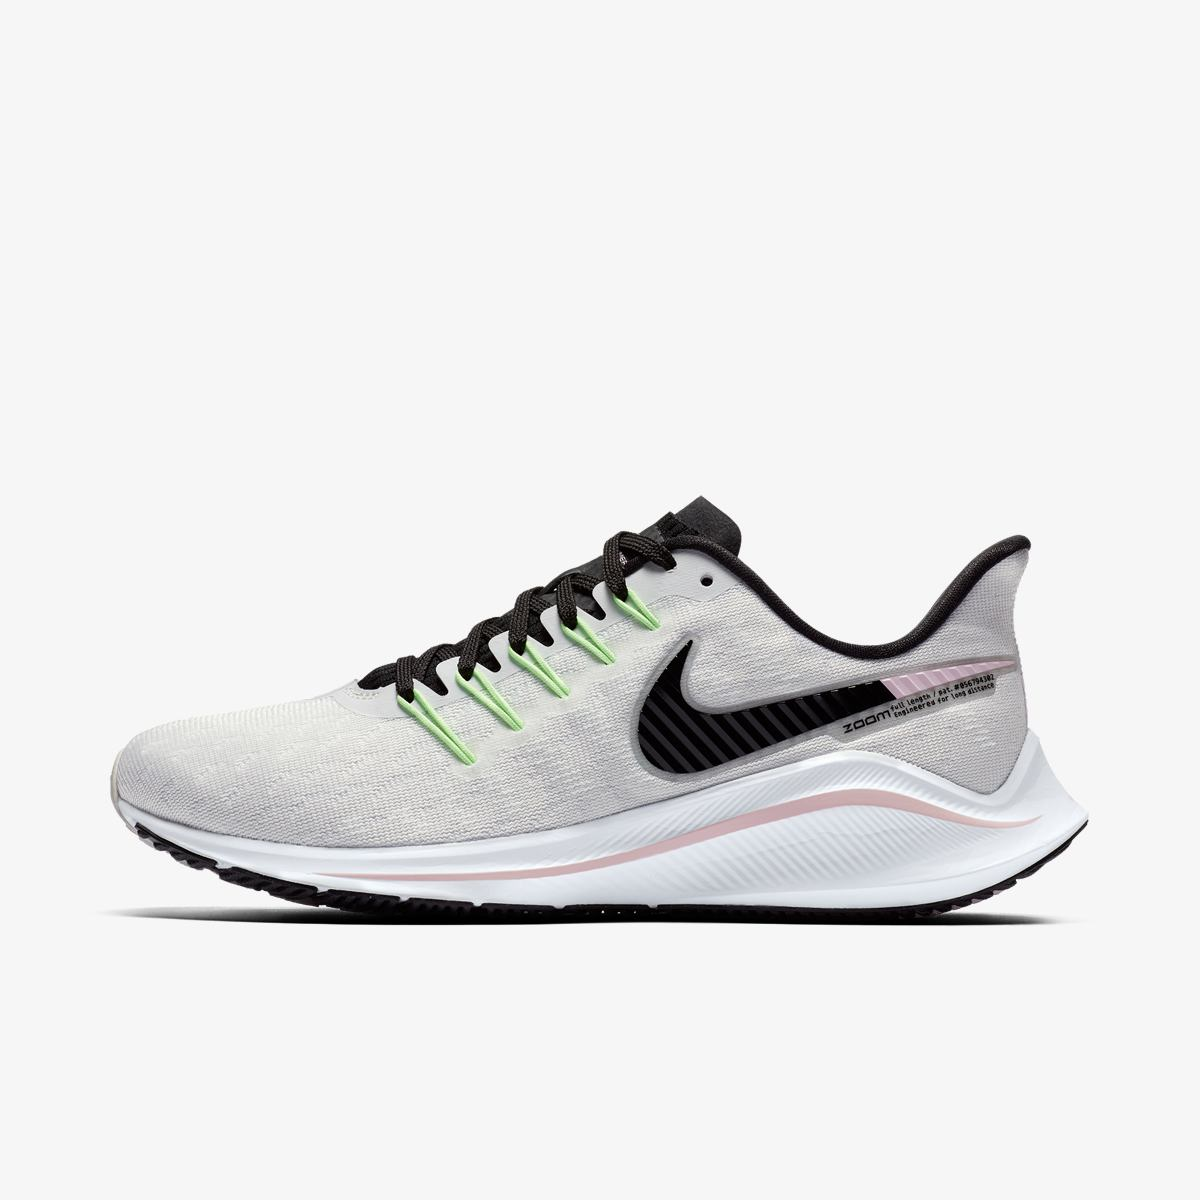 416473bbe5b2 Кроссовки для бега Nike WMNS AIR ZOOM VOMERO 14 AH7858-002 купить ...